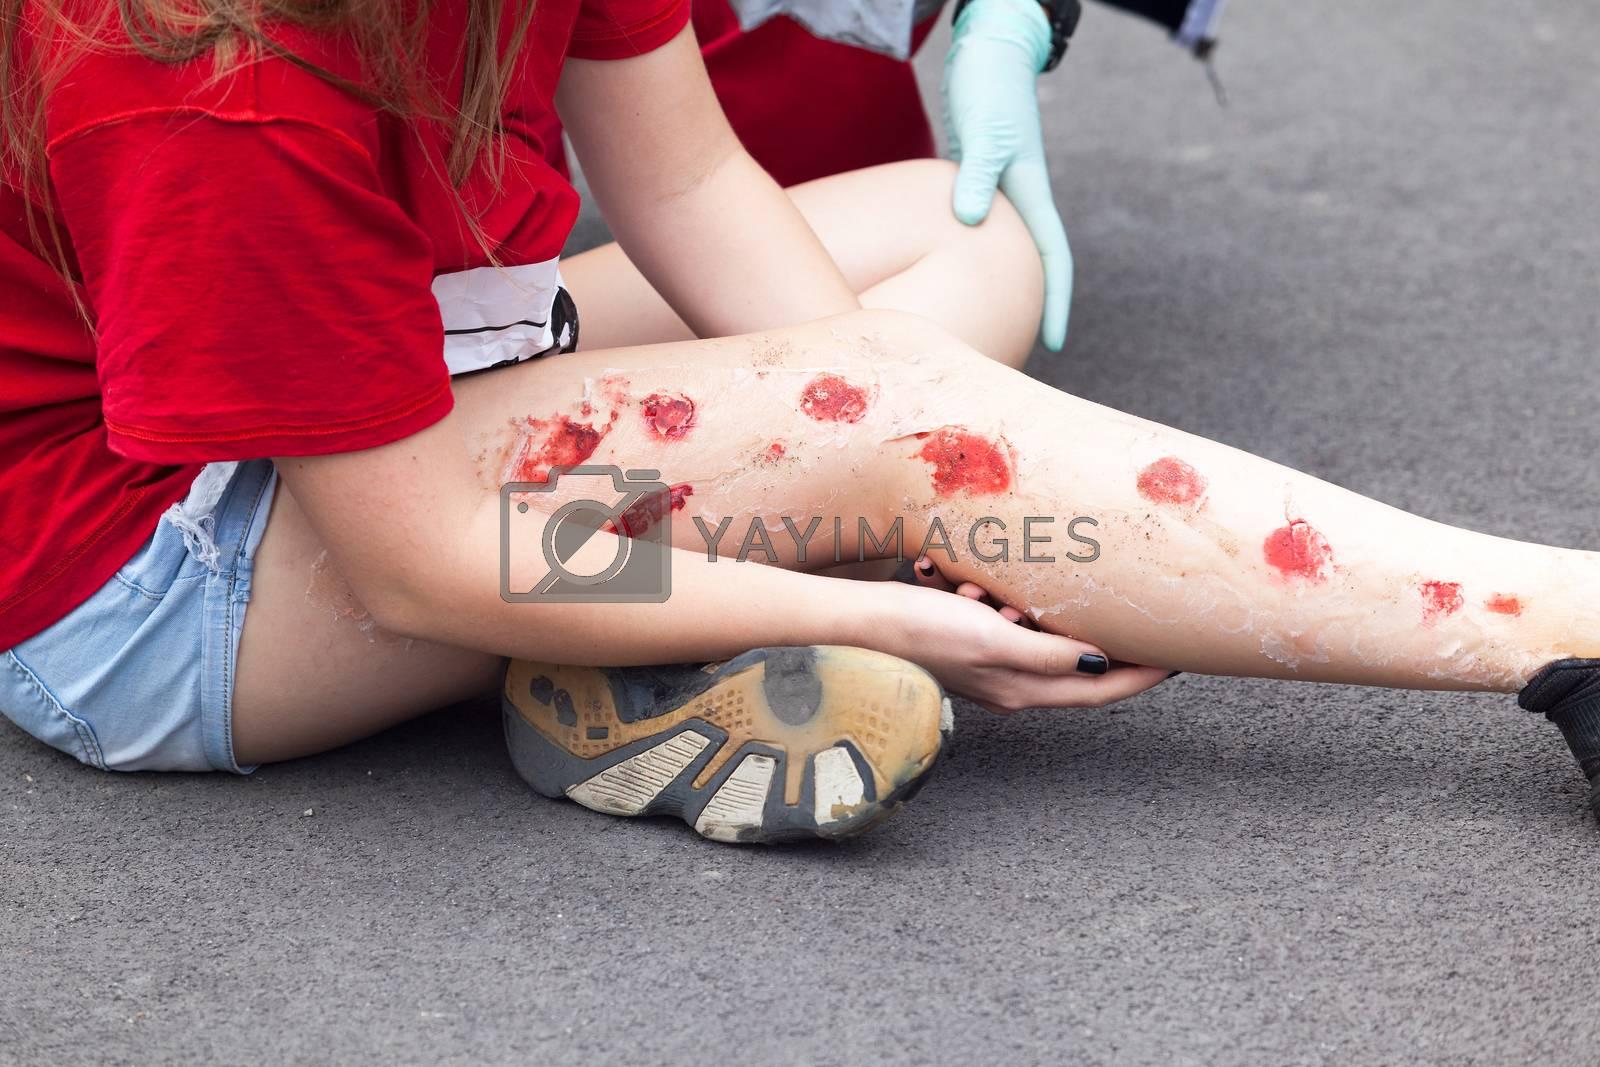 Simulation of leg injury. First aid training.